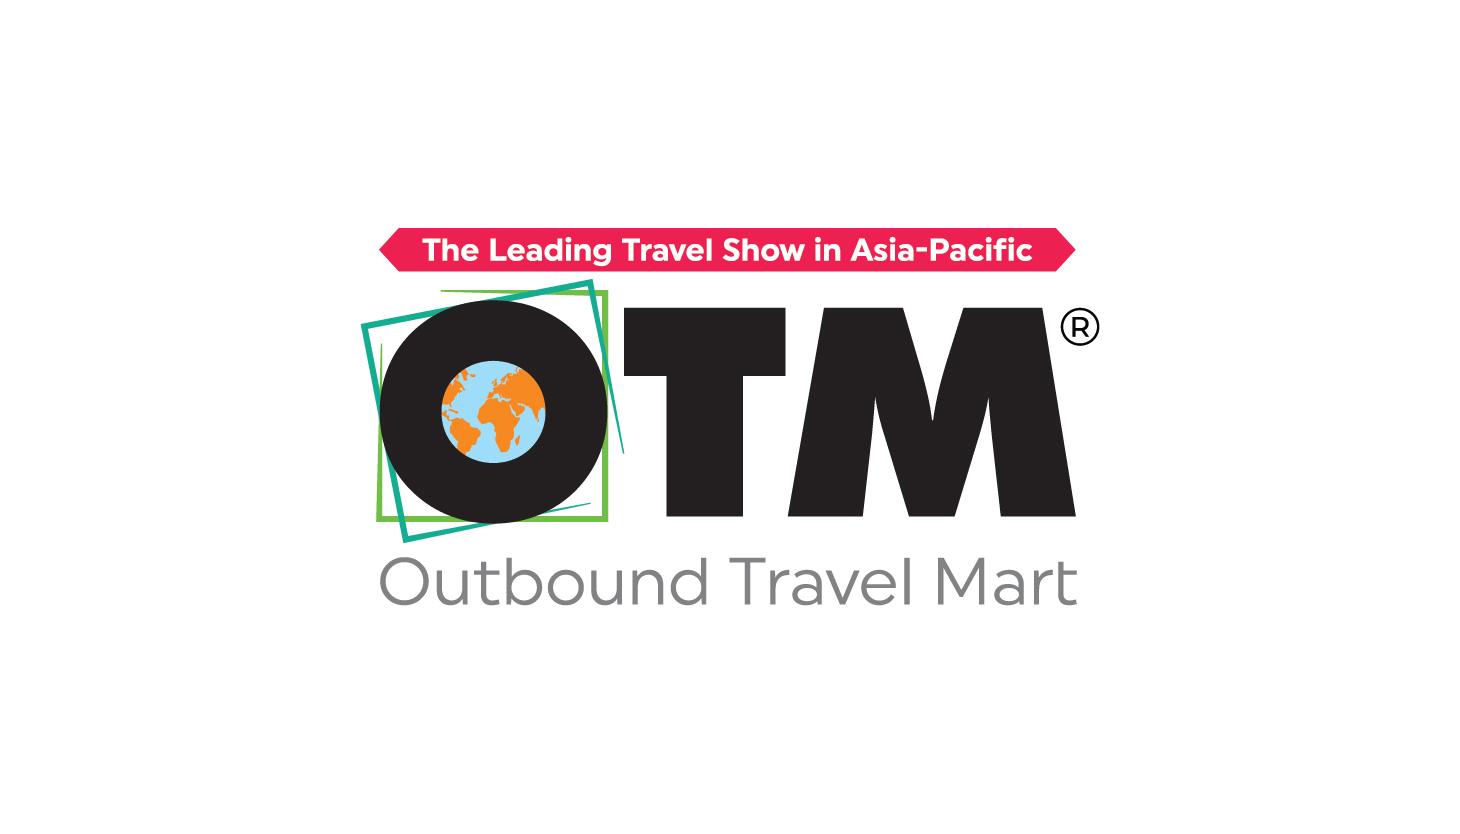 OTM 2020, Mumbai, Maharashtra, India